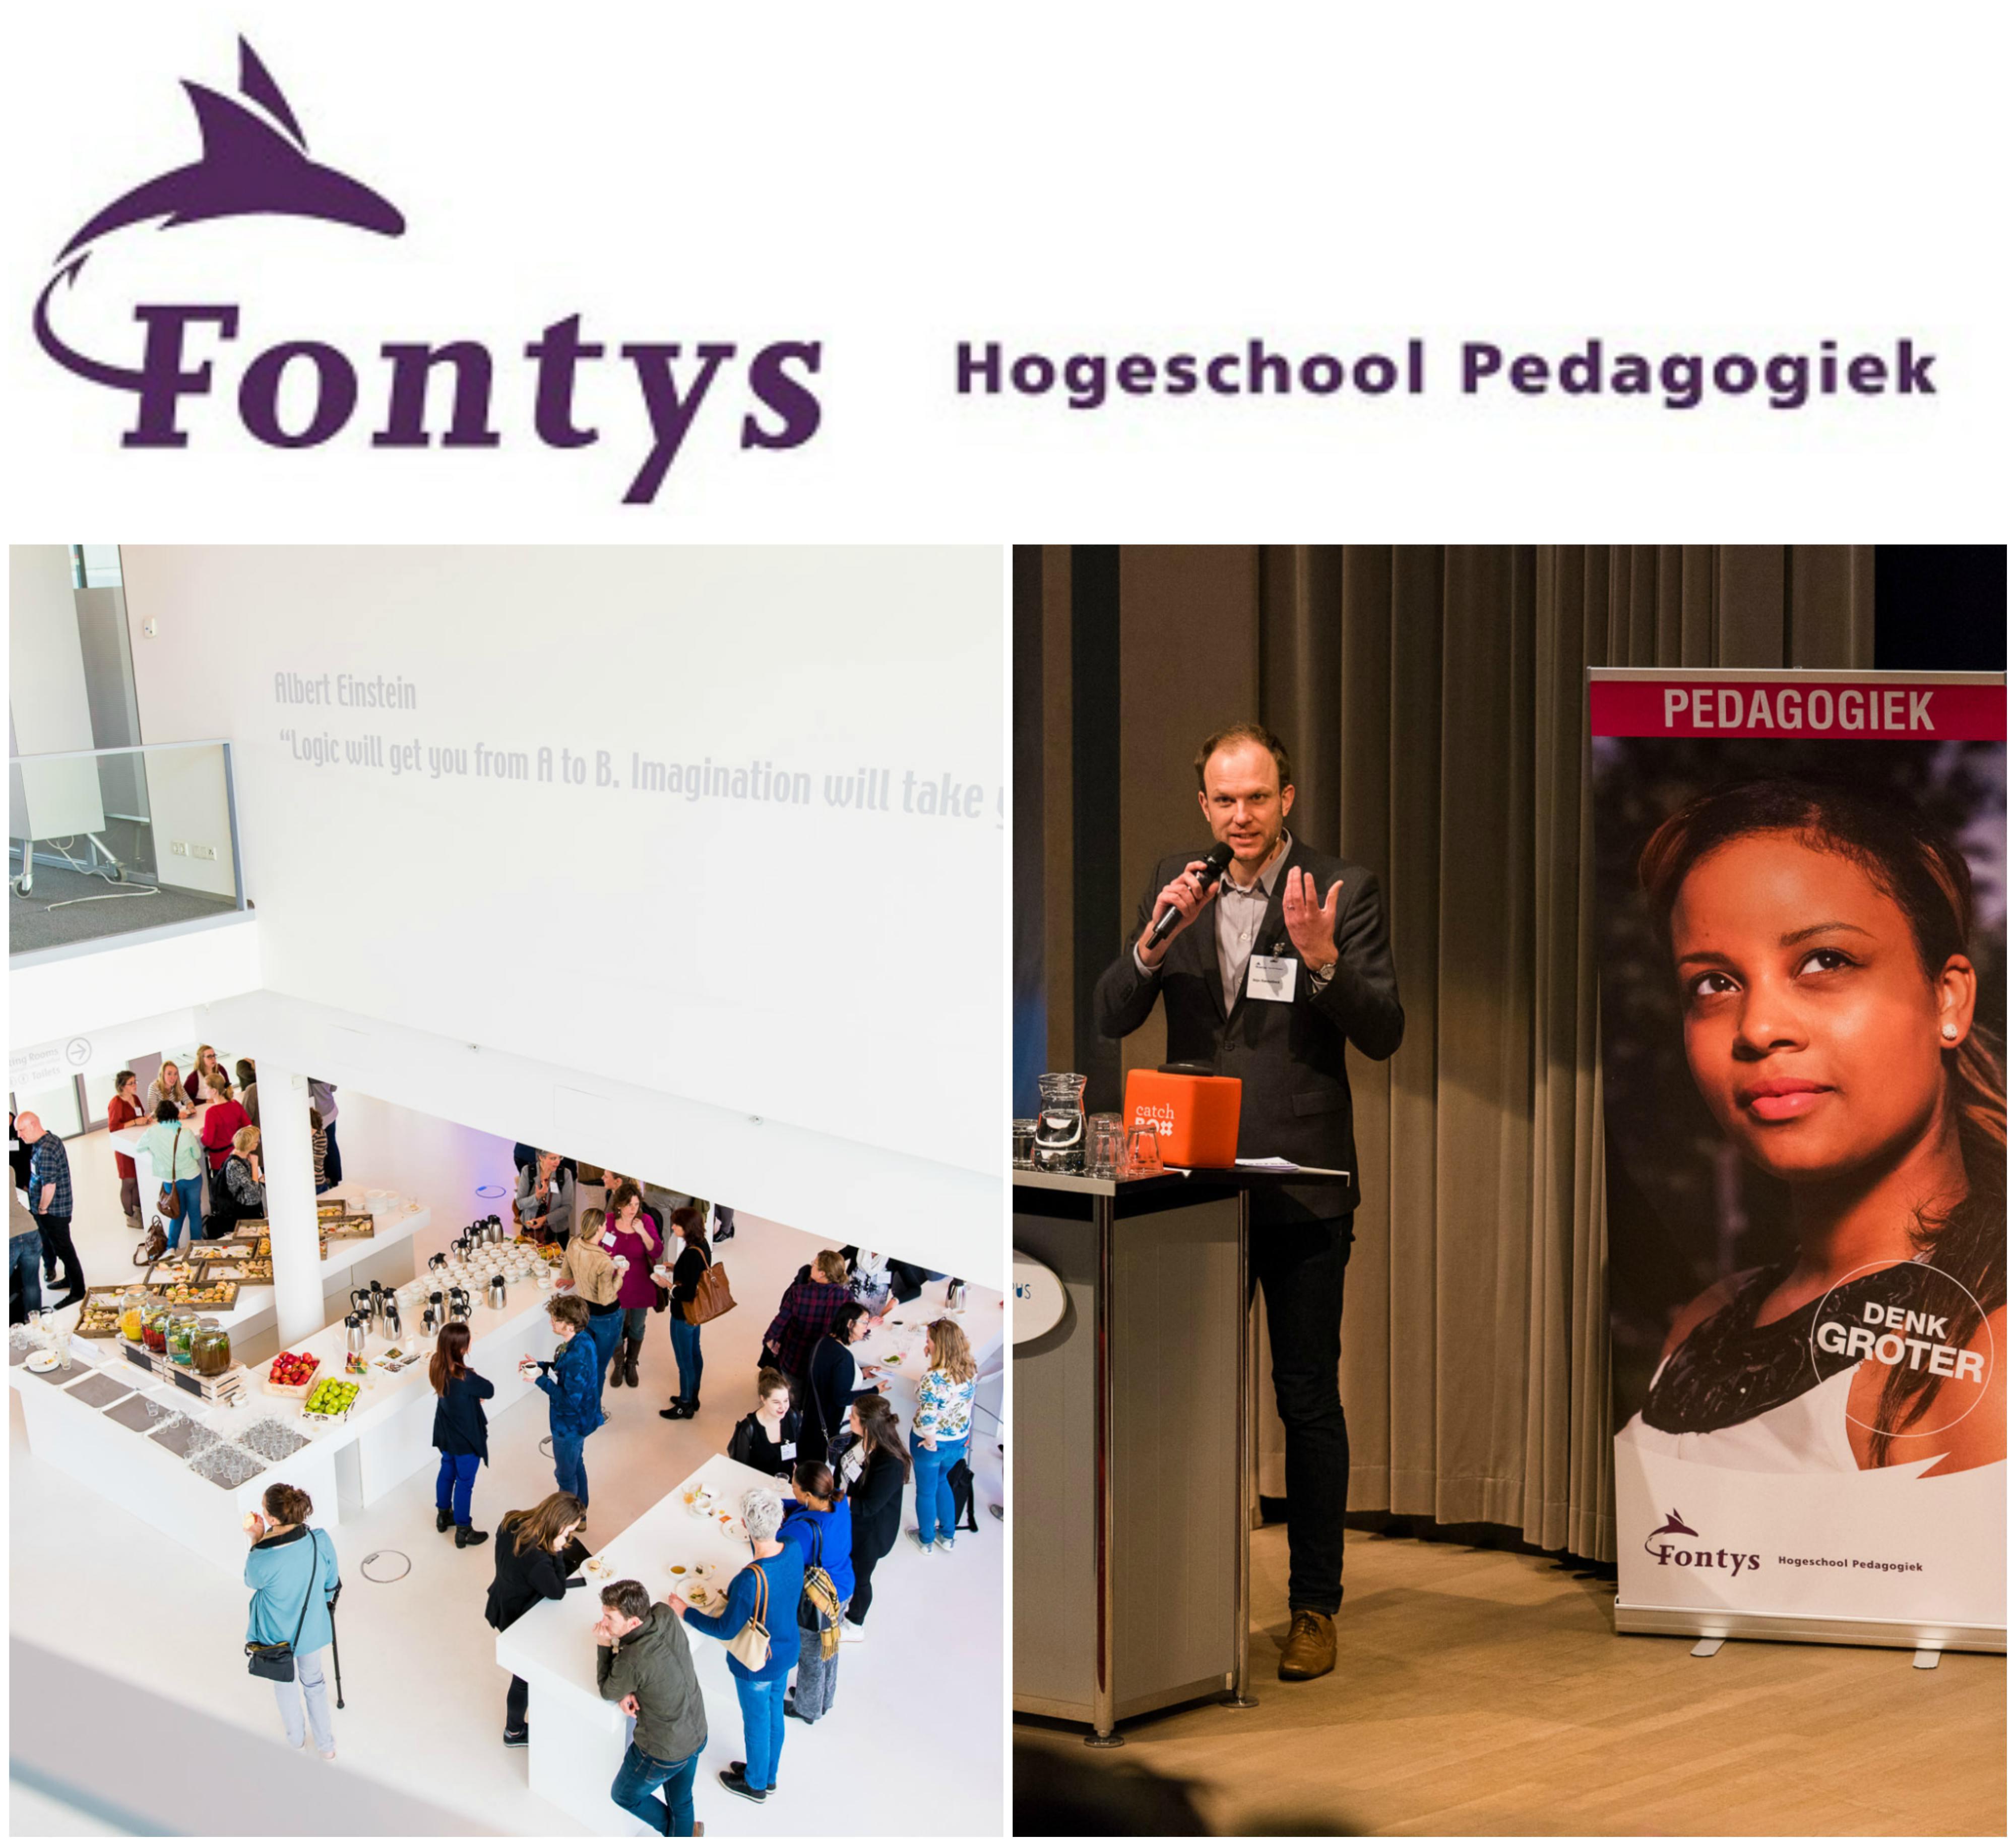 Symposium Autoriteit en Pedagogiek